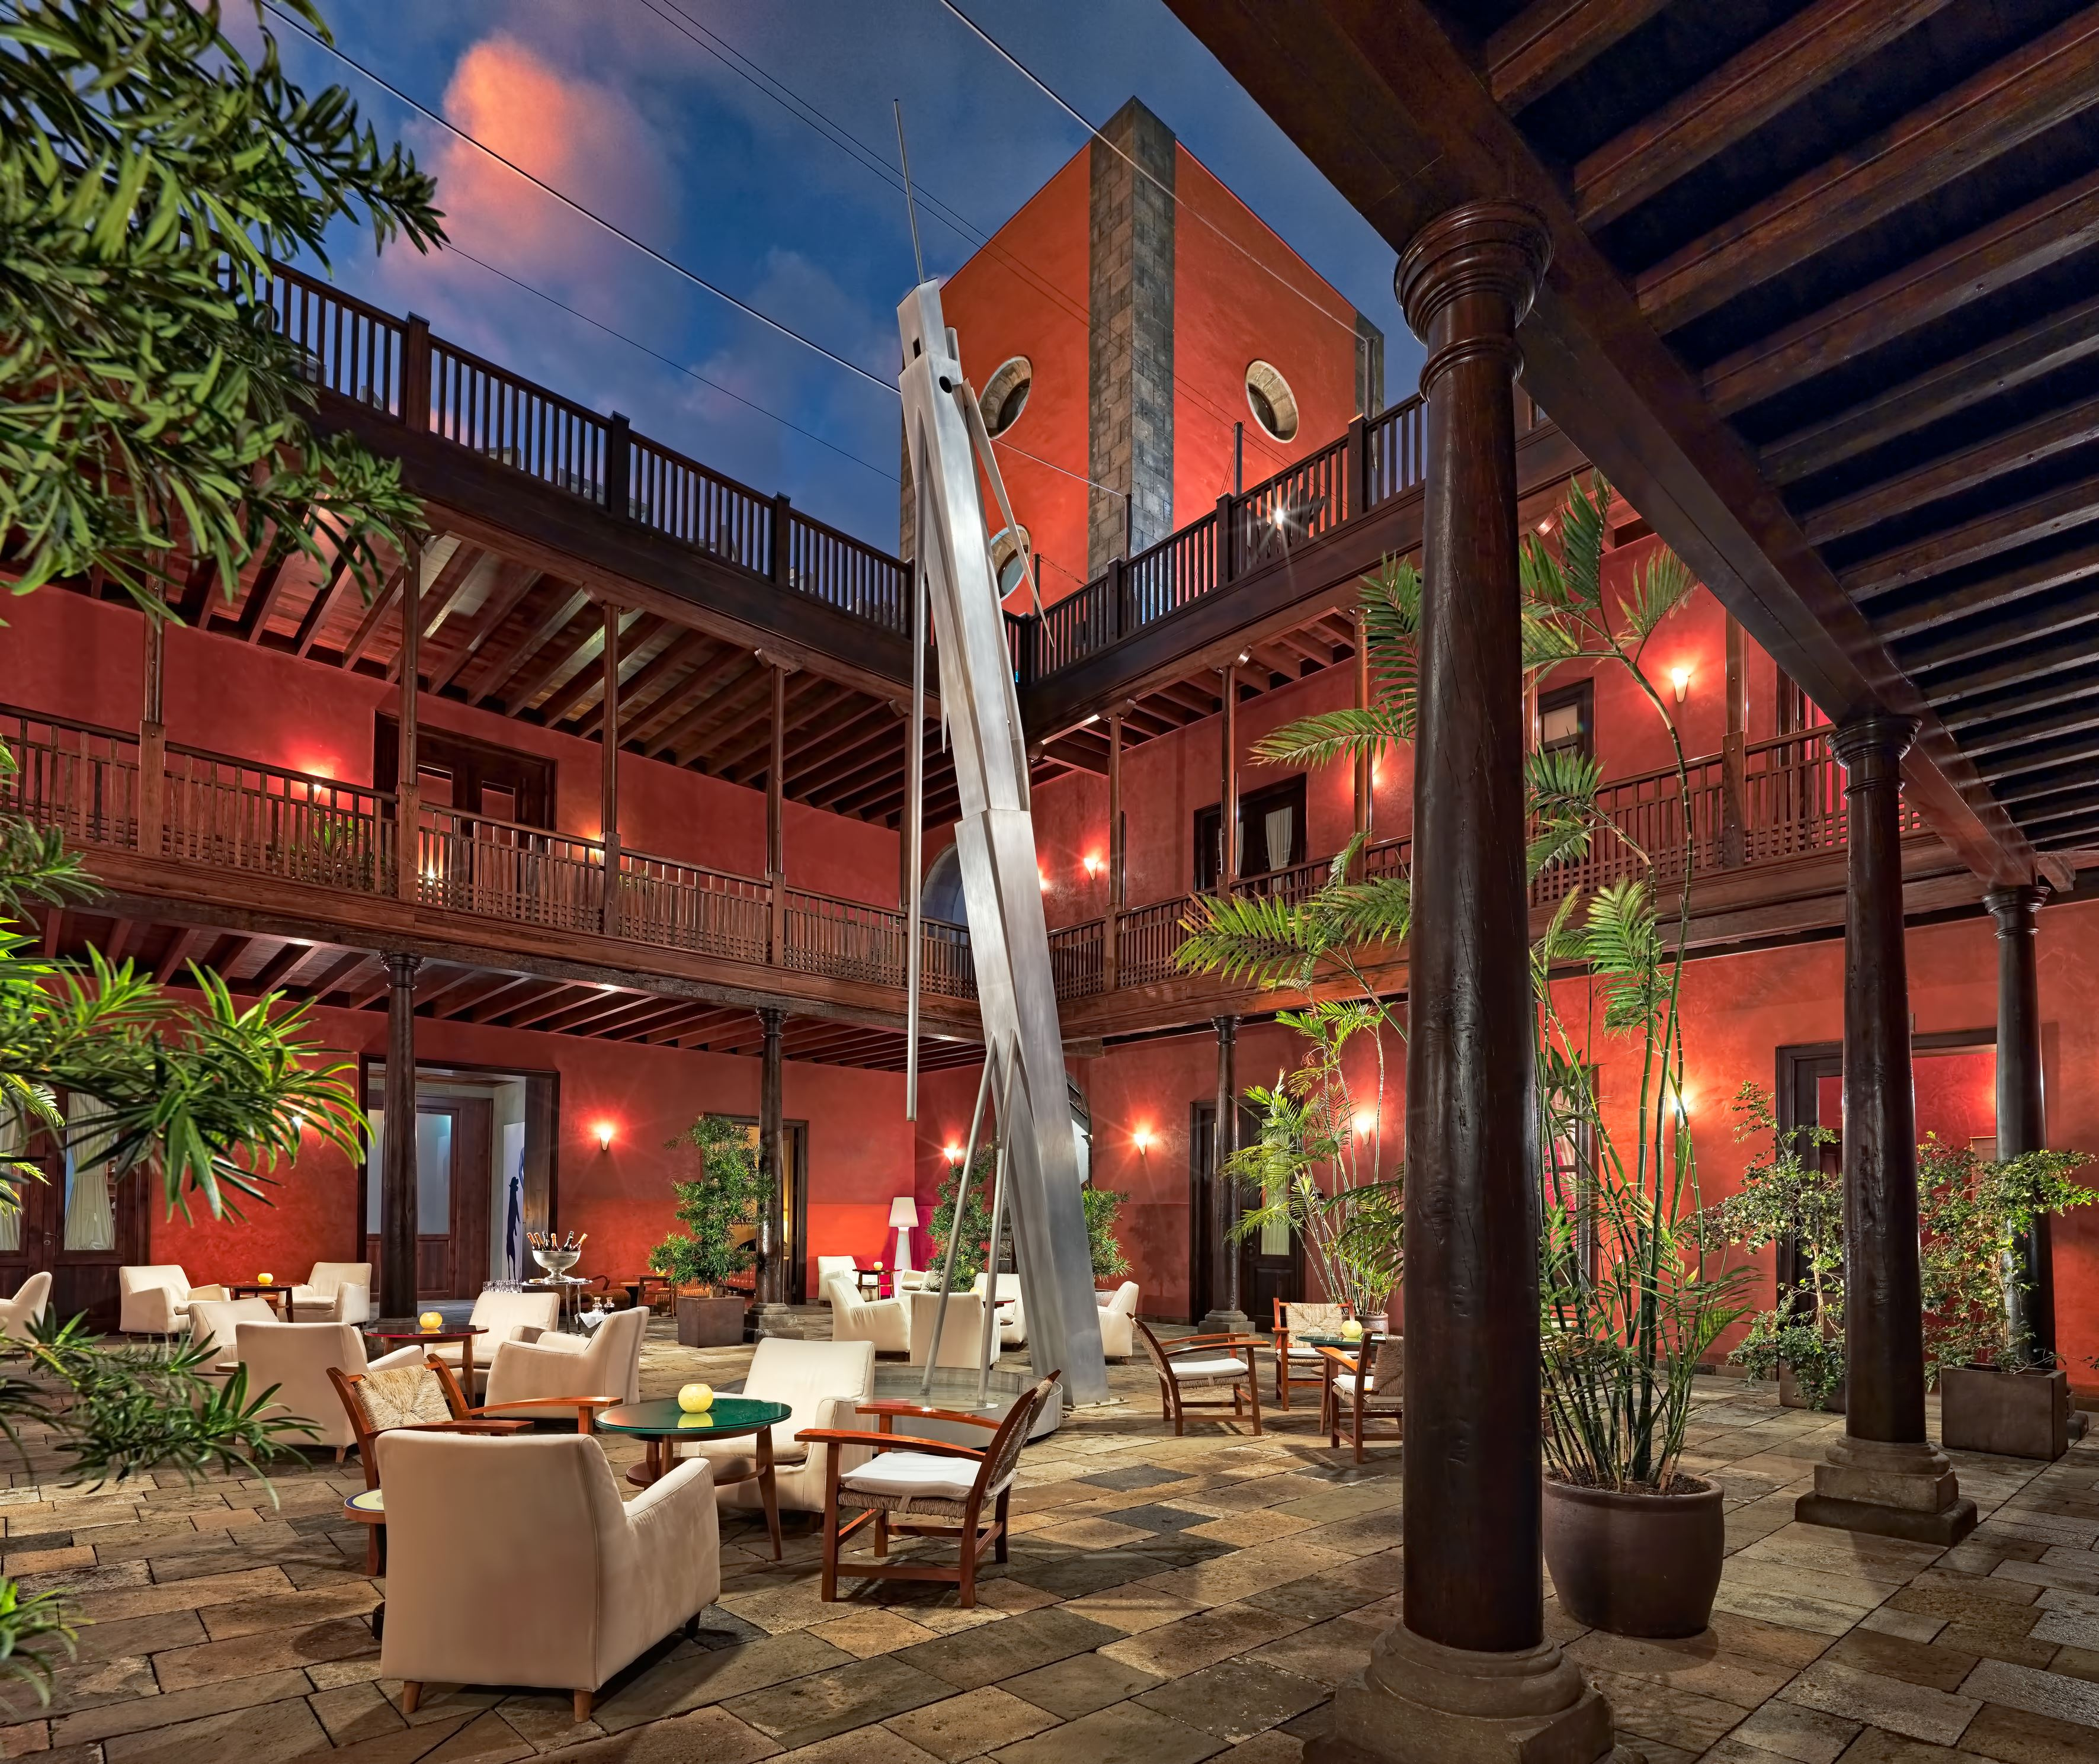 Patio på hotell San Roque, Garachico Teneriffa